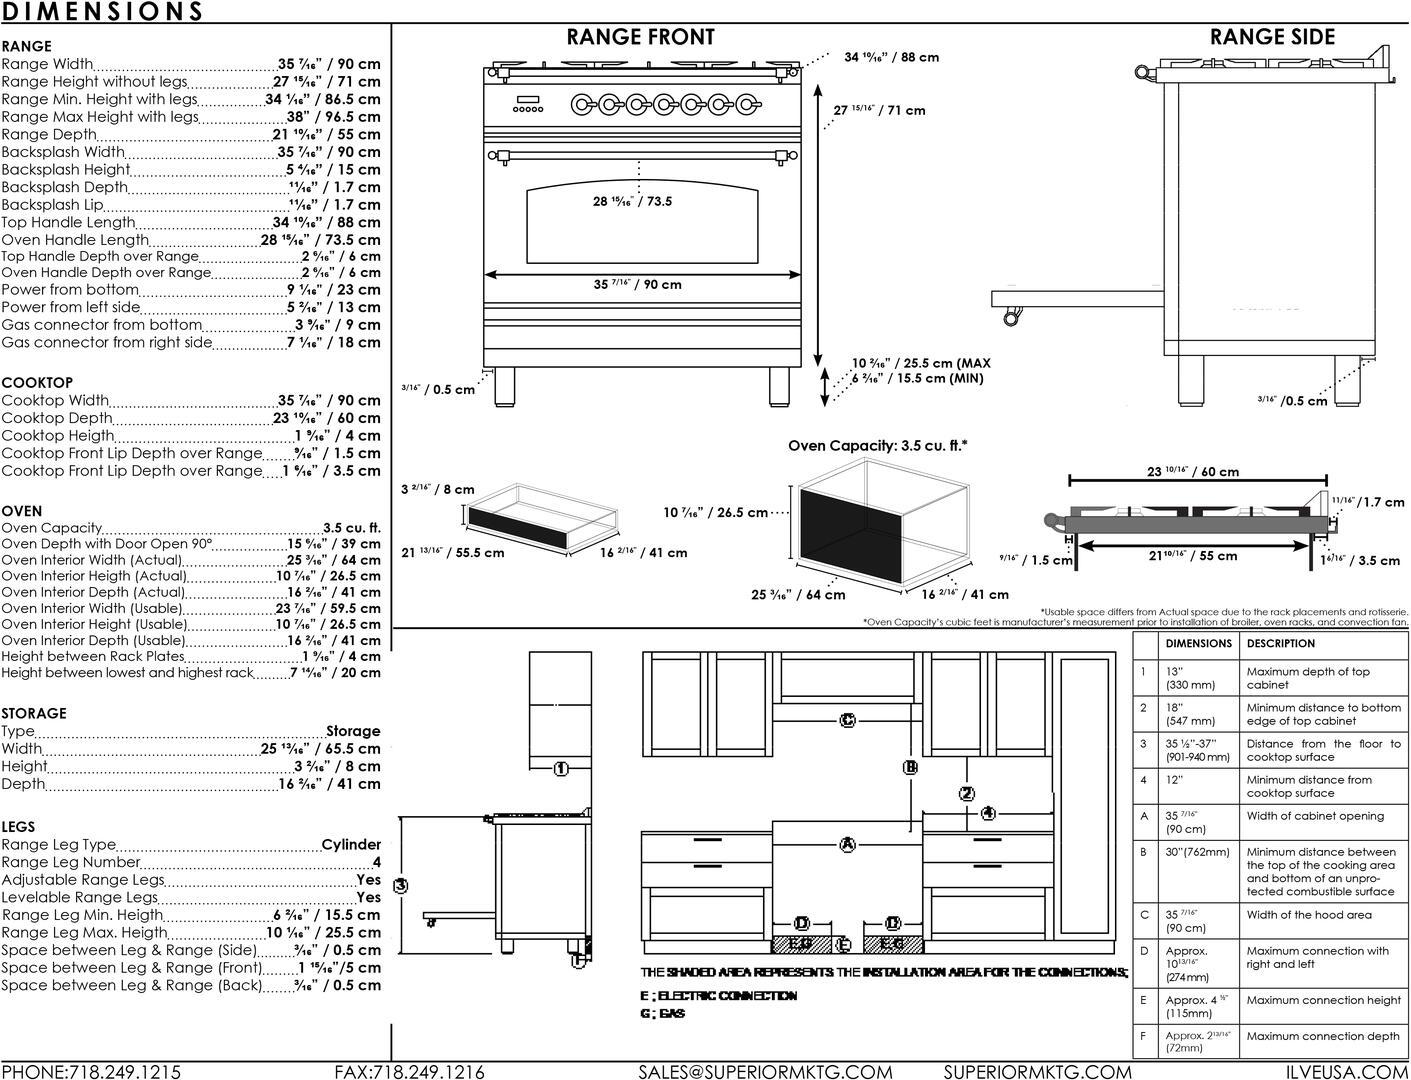 Ilve Professional Plus UPW90FDMPM Freestanding Dual Fuel Range Graphite, Dimensions Guide